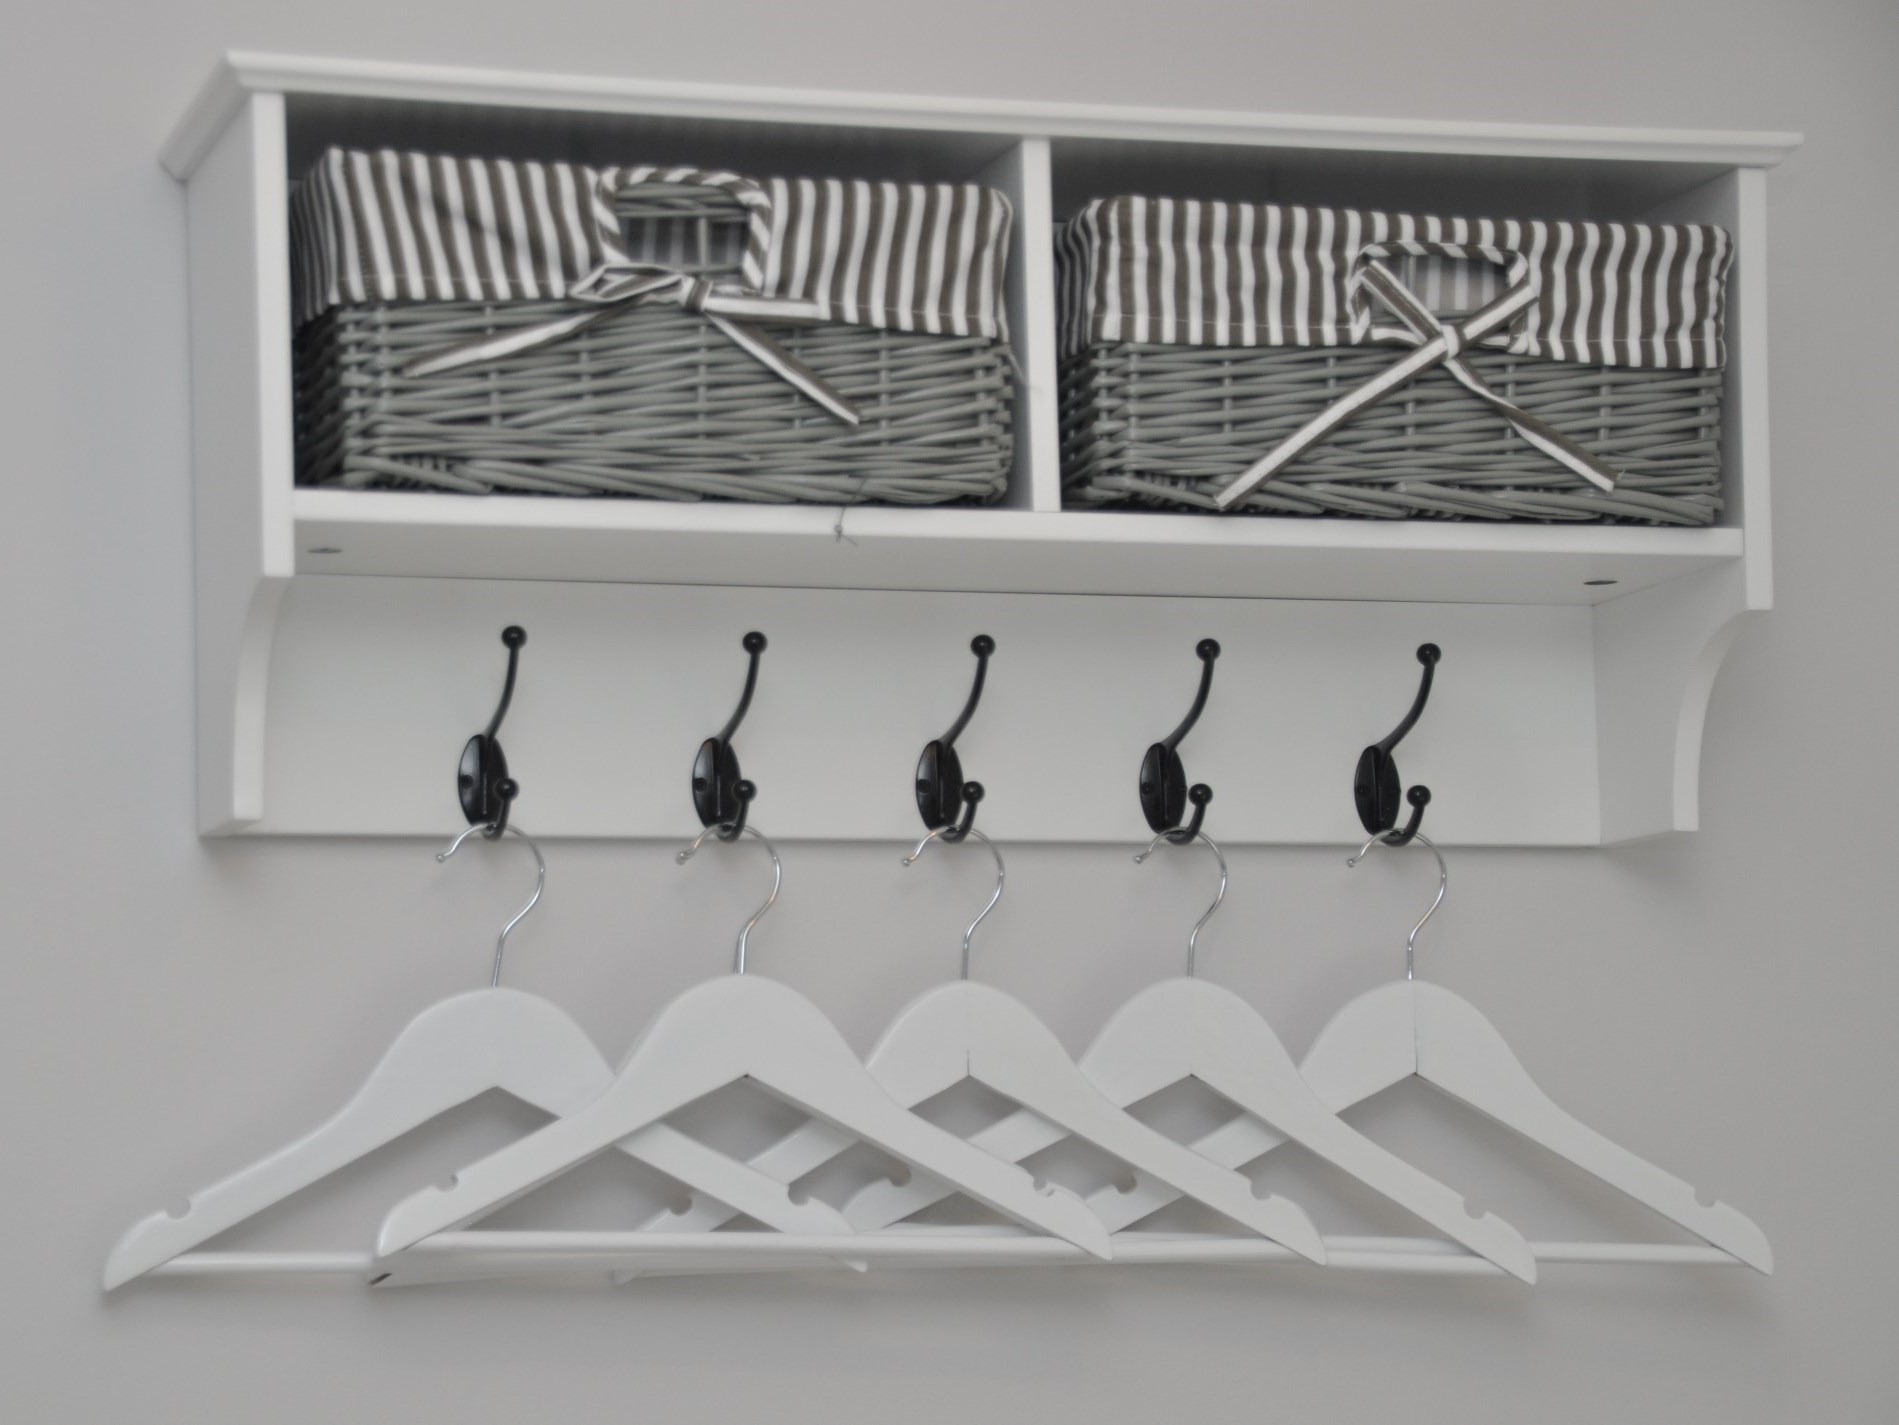 Stylish hanging space